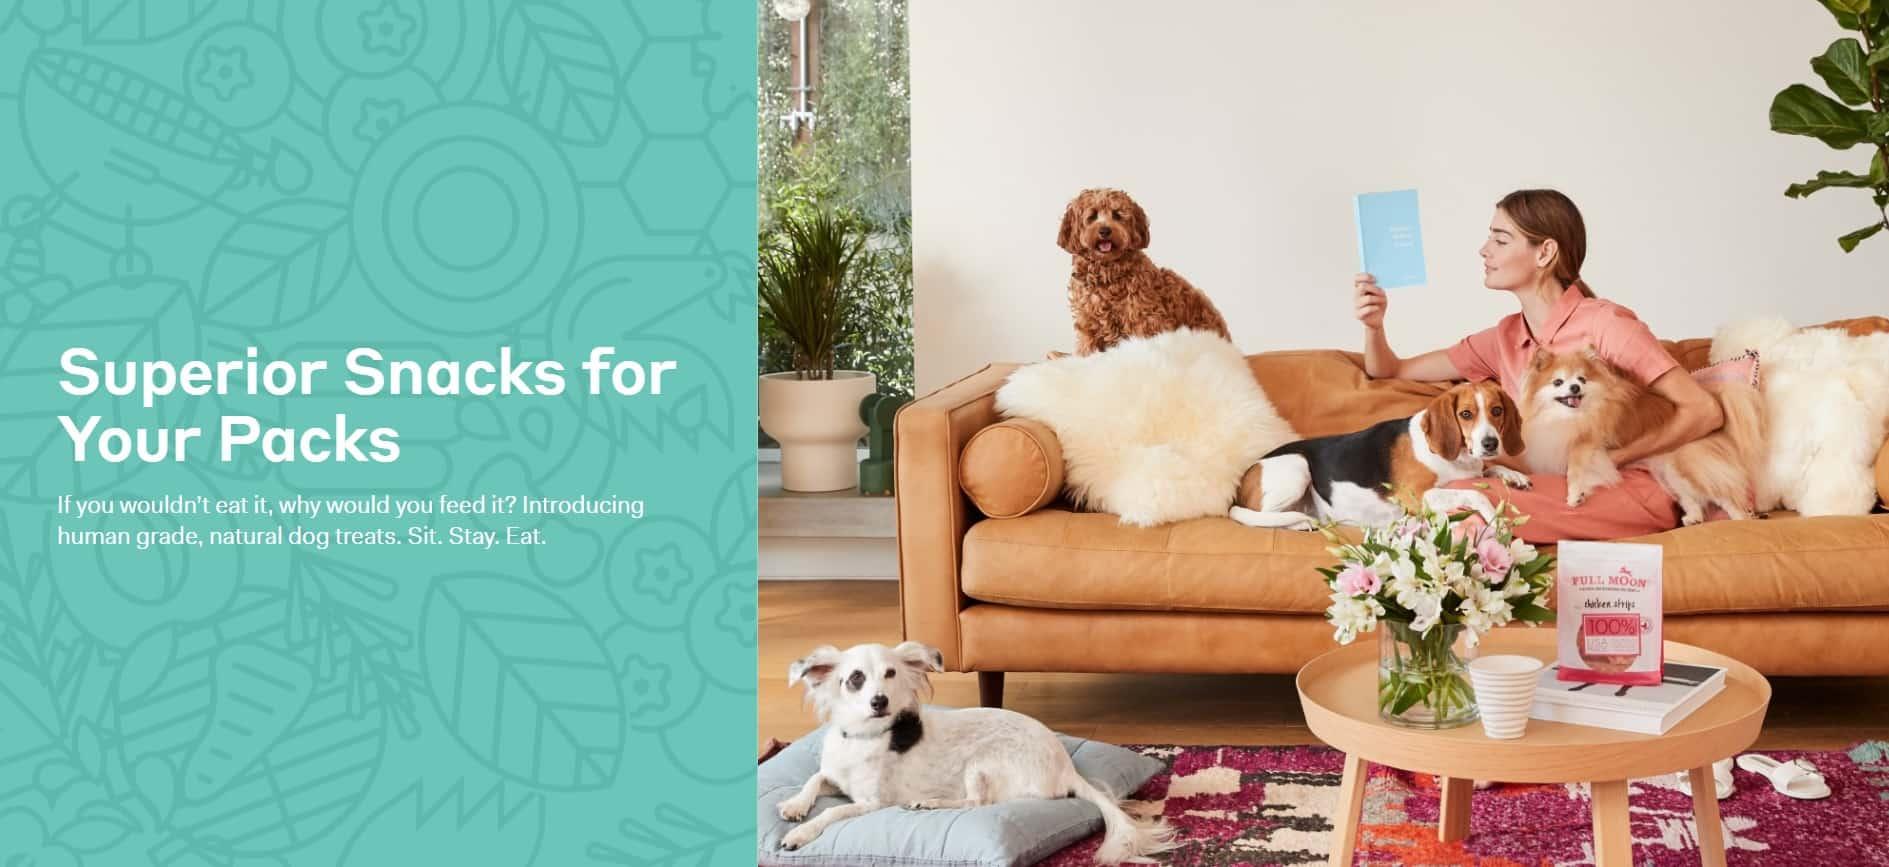 Full Moon Dog Treats Review [year]: Best Human-Grade Treats? 11